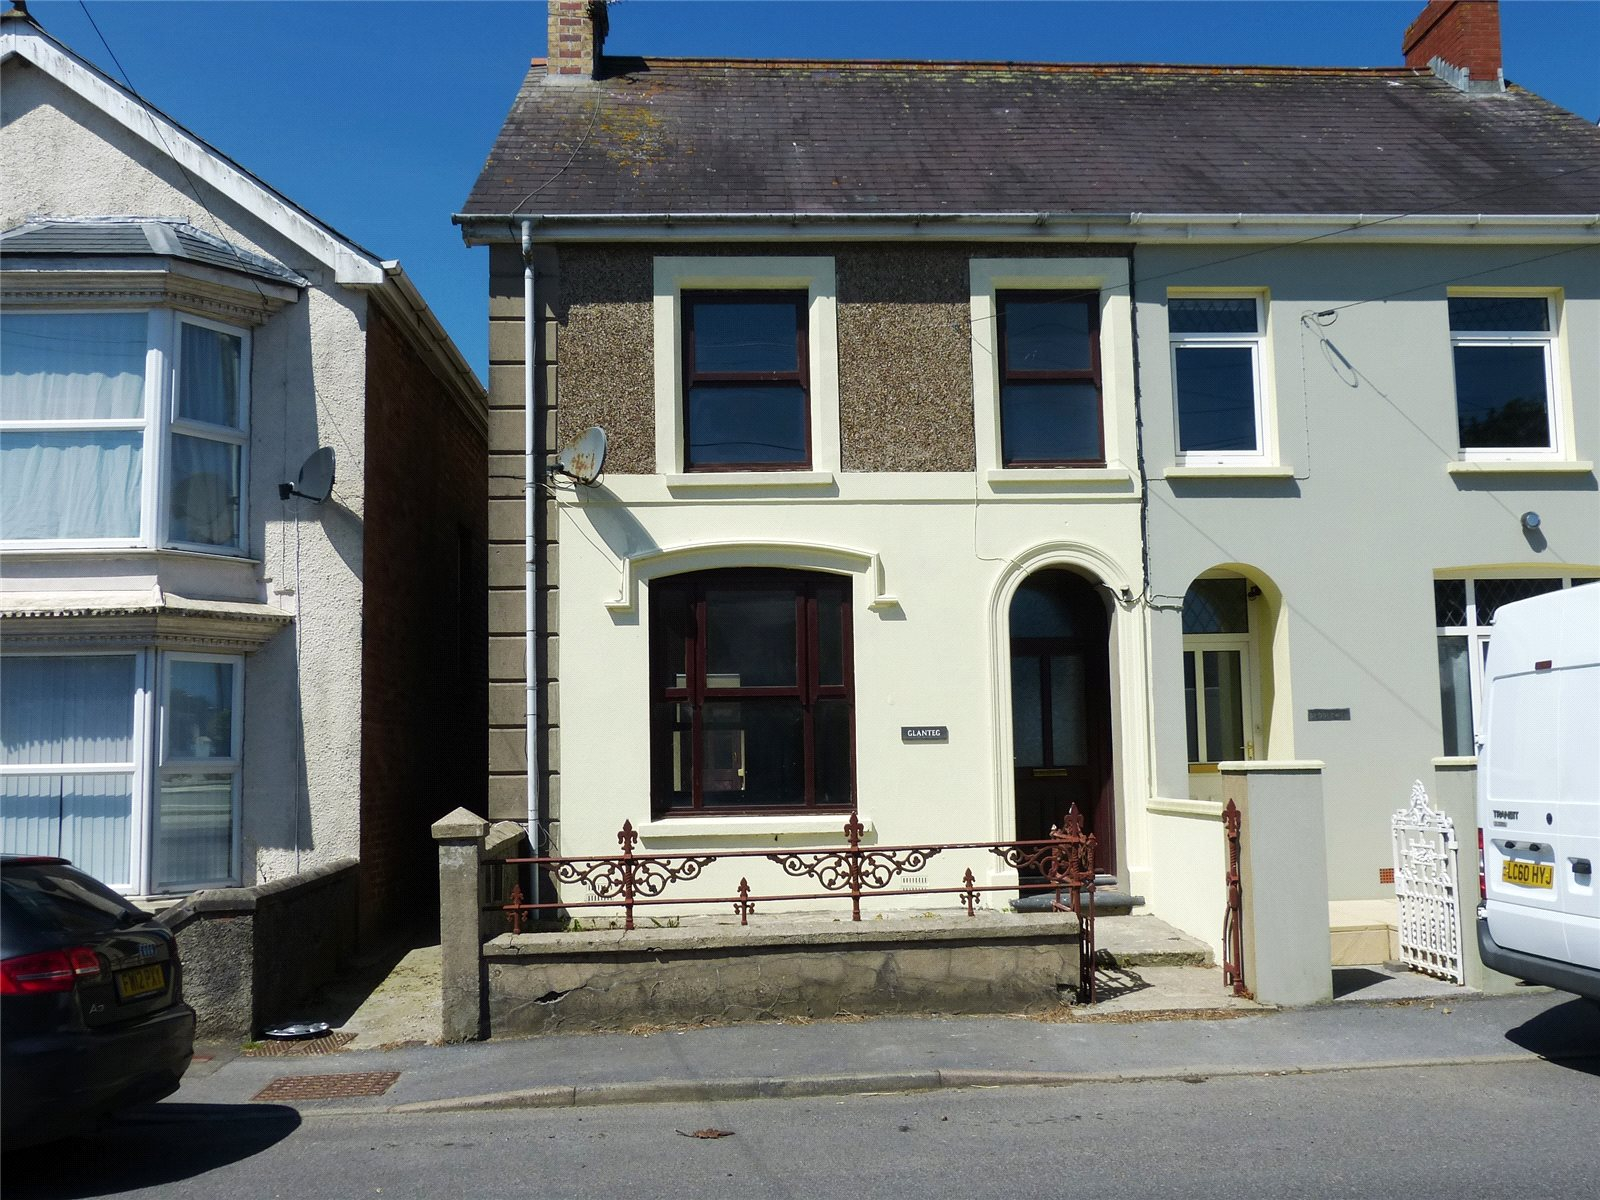 3 Bedrooms Semi Detached House for sale in Glanteg, Clynderwen, Pembrokeshire